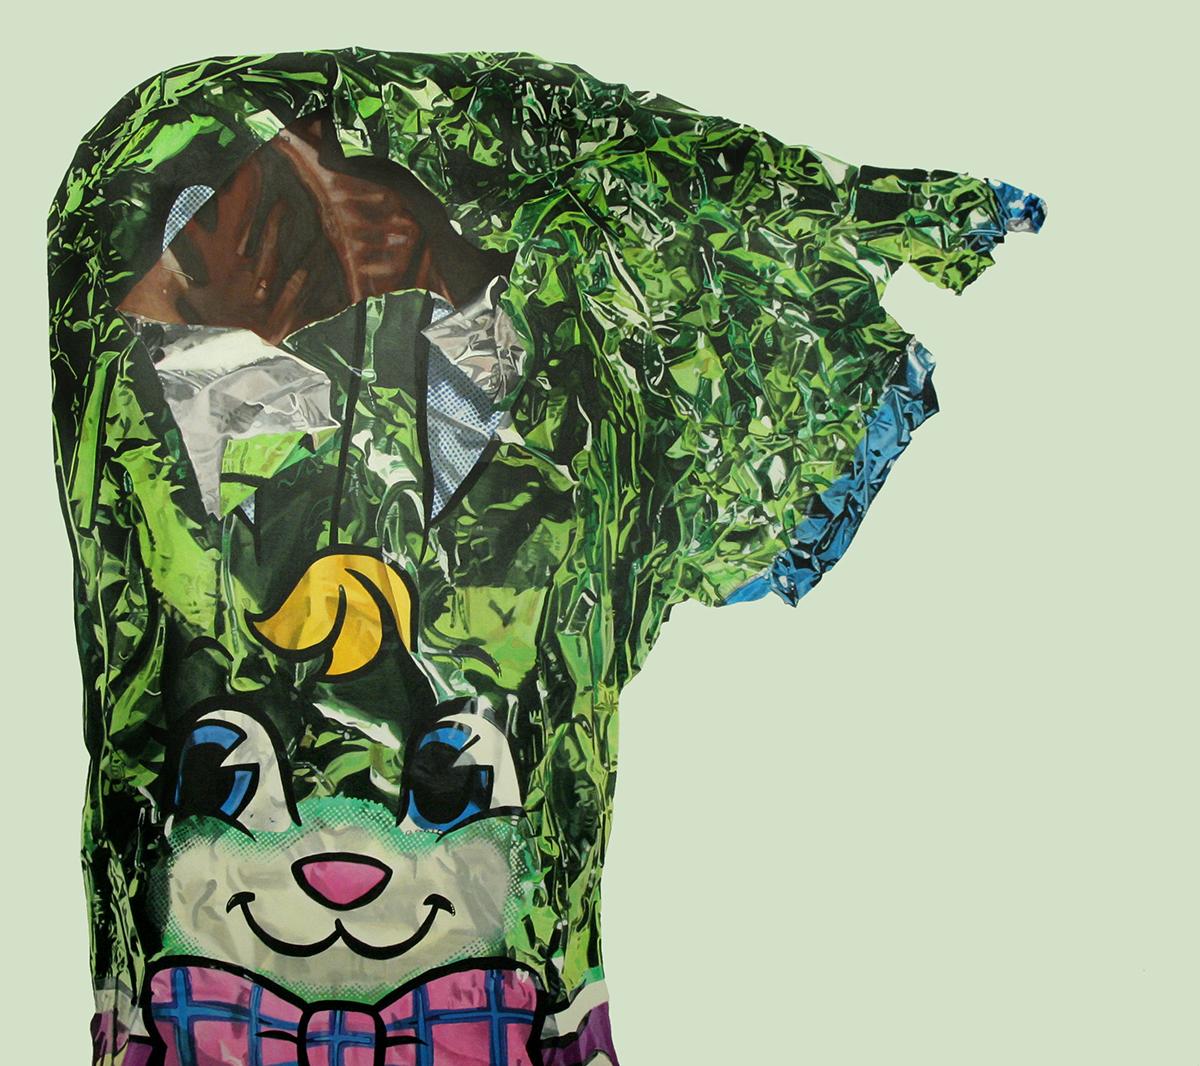 Foil Bunny #2 (Green Foil Bunny)